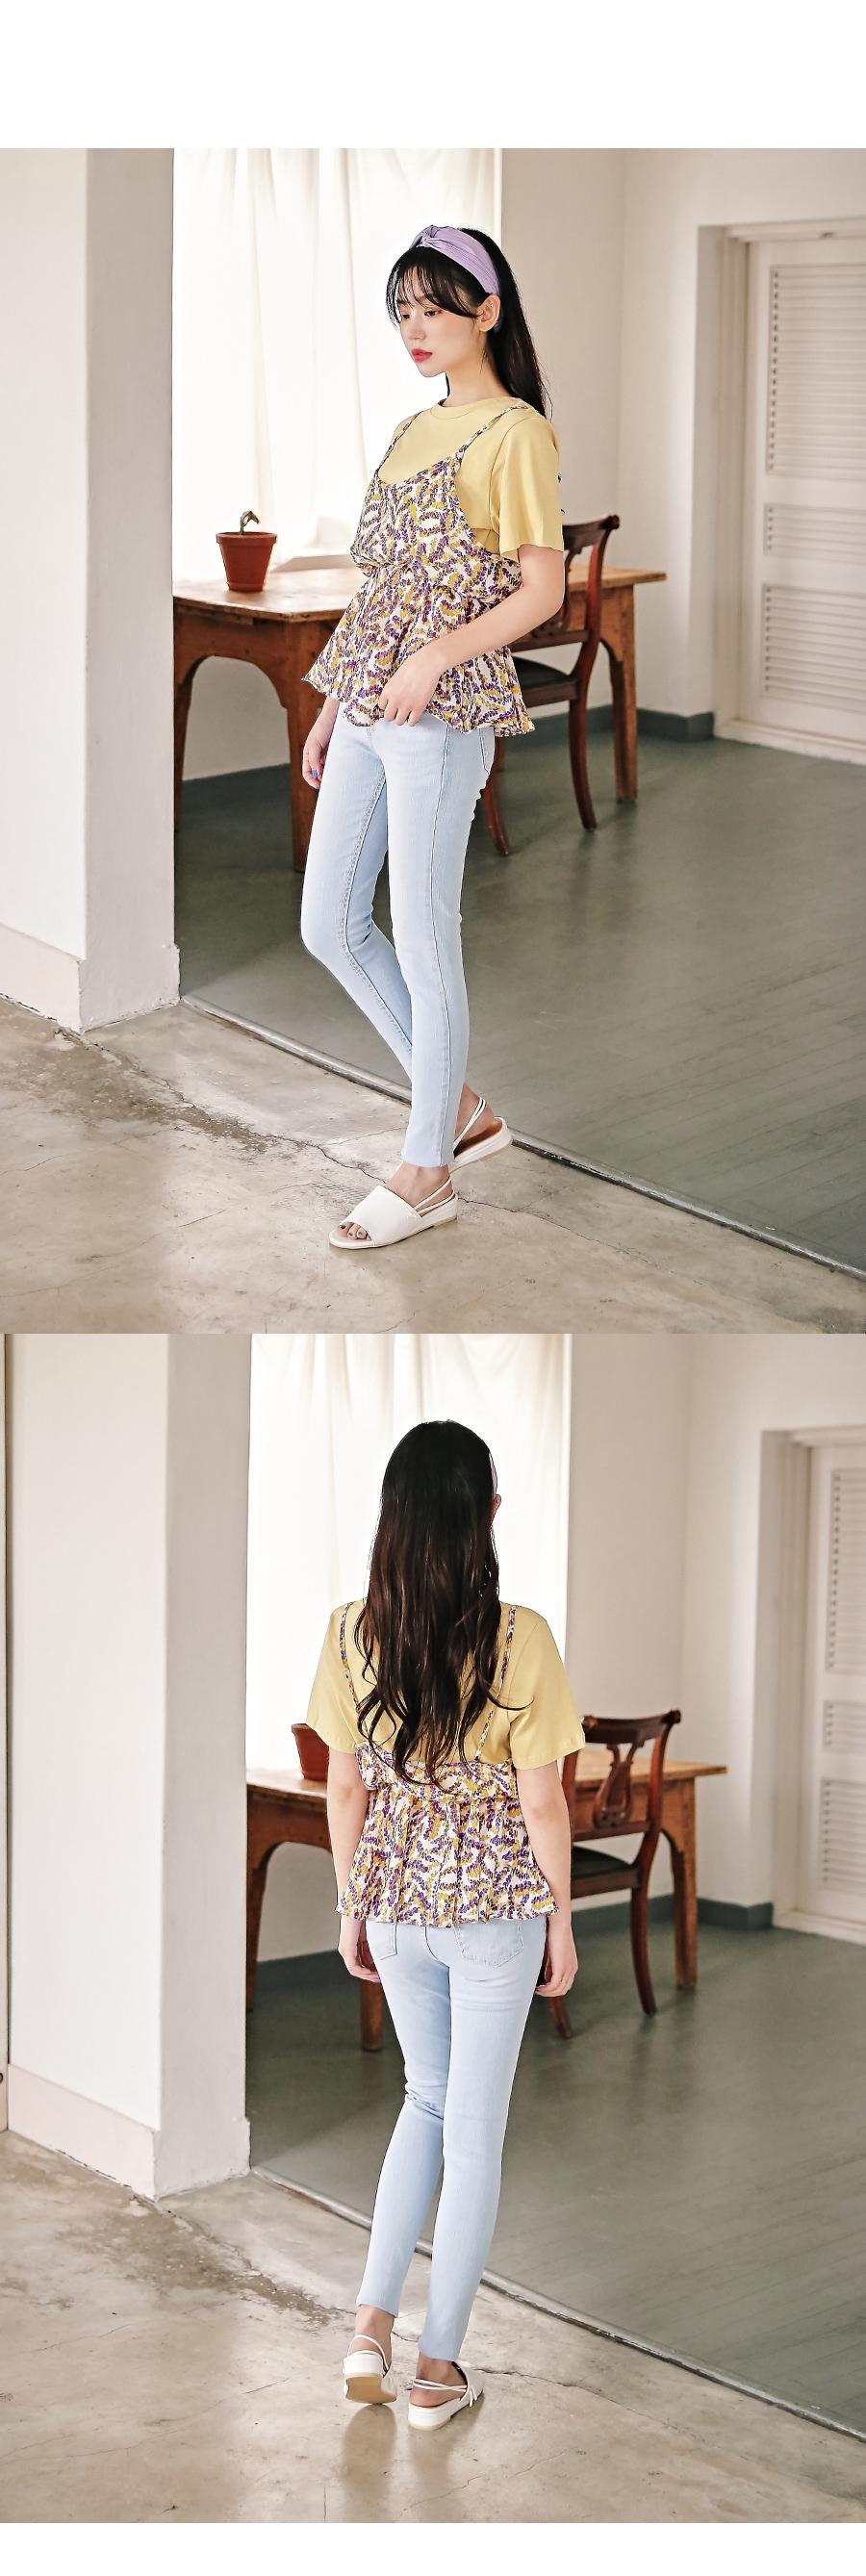 Plan strap sandals